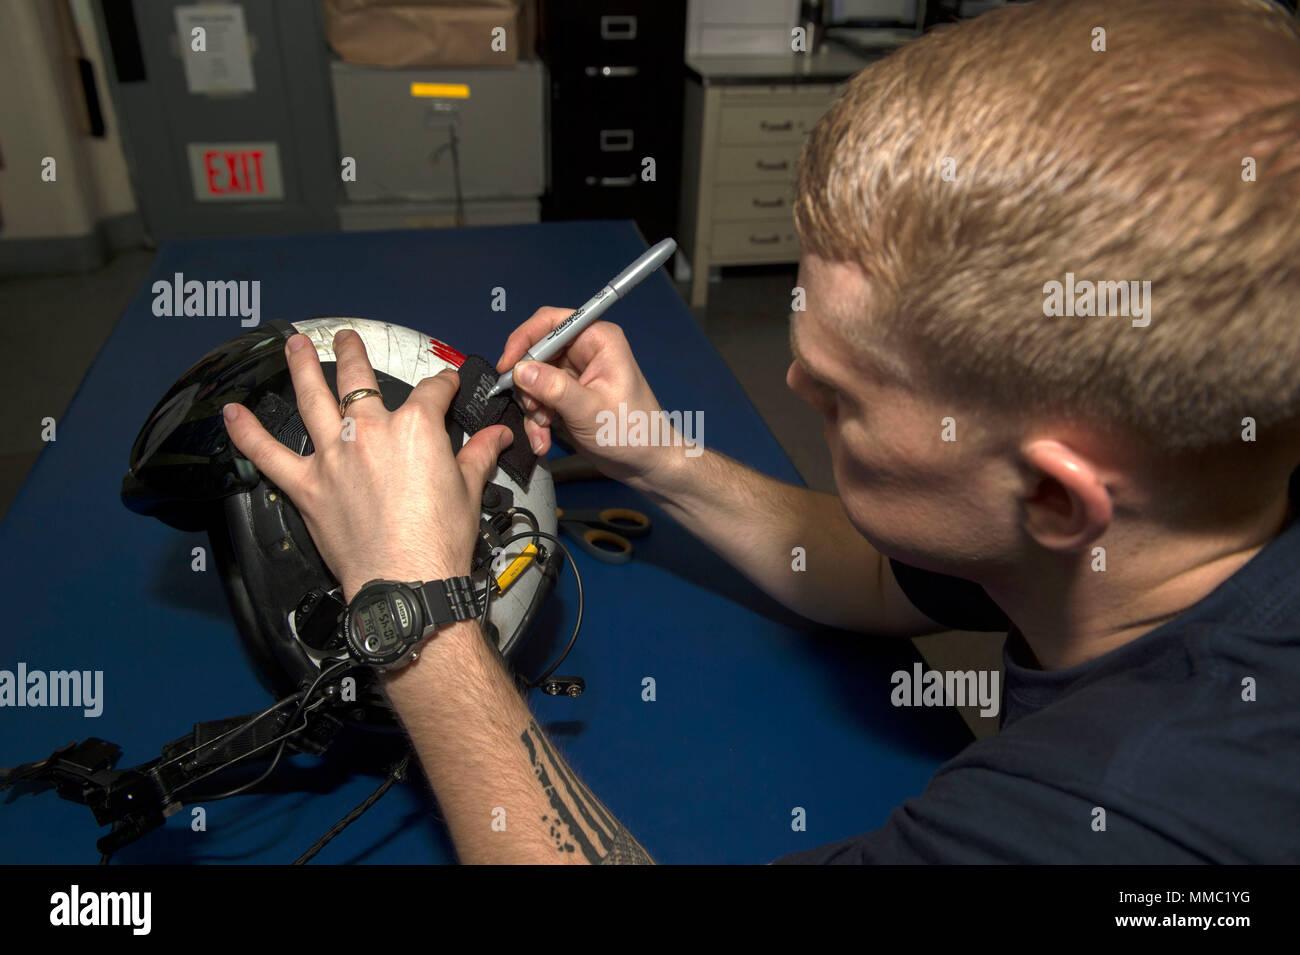 Parachute Rigger Stockfotos & Parachute Rigger Bilder - Alamy